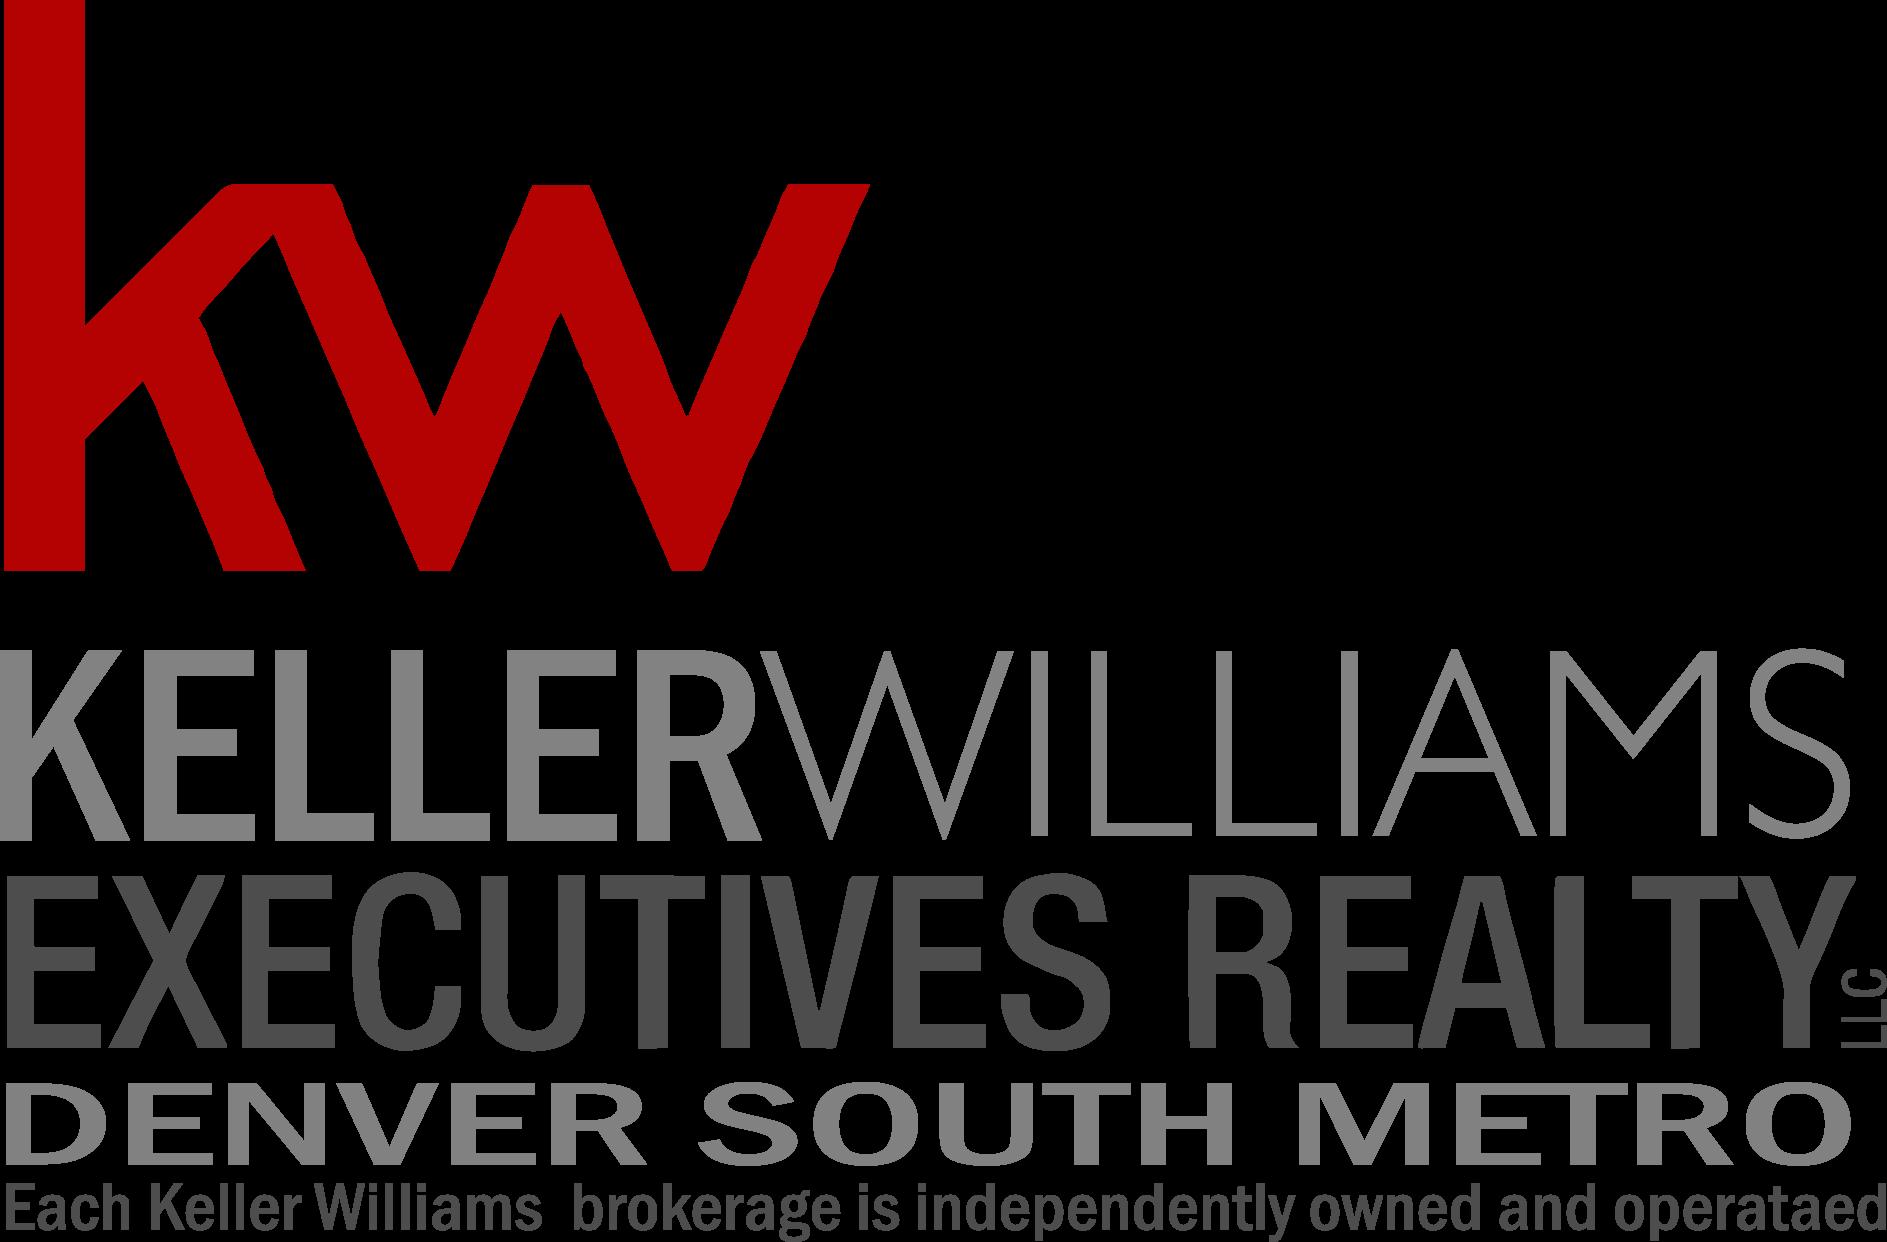 Keller Williams Executives